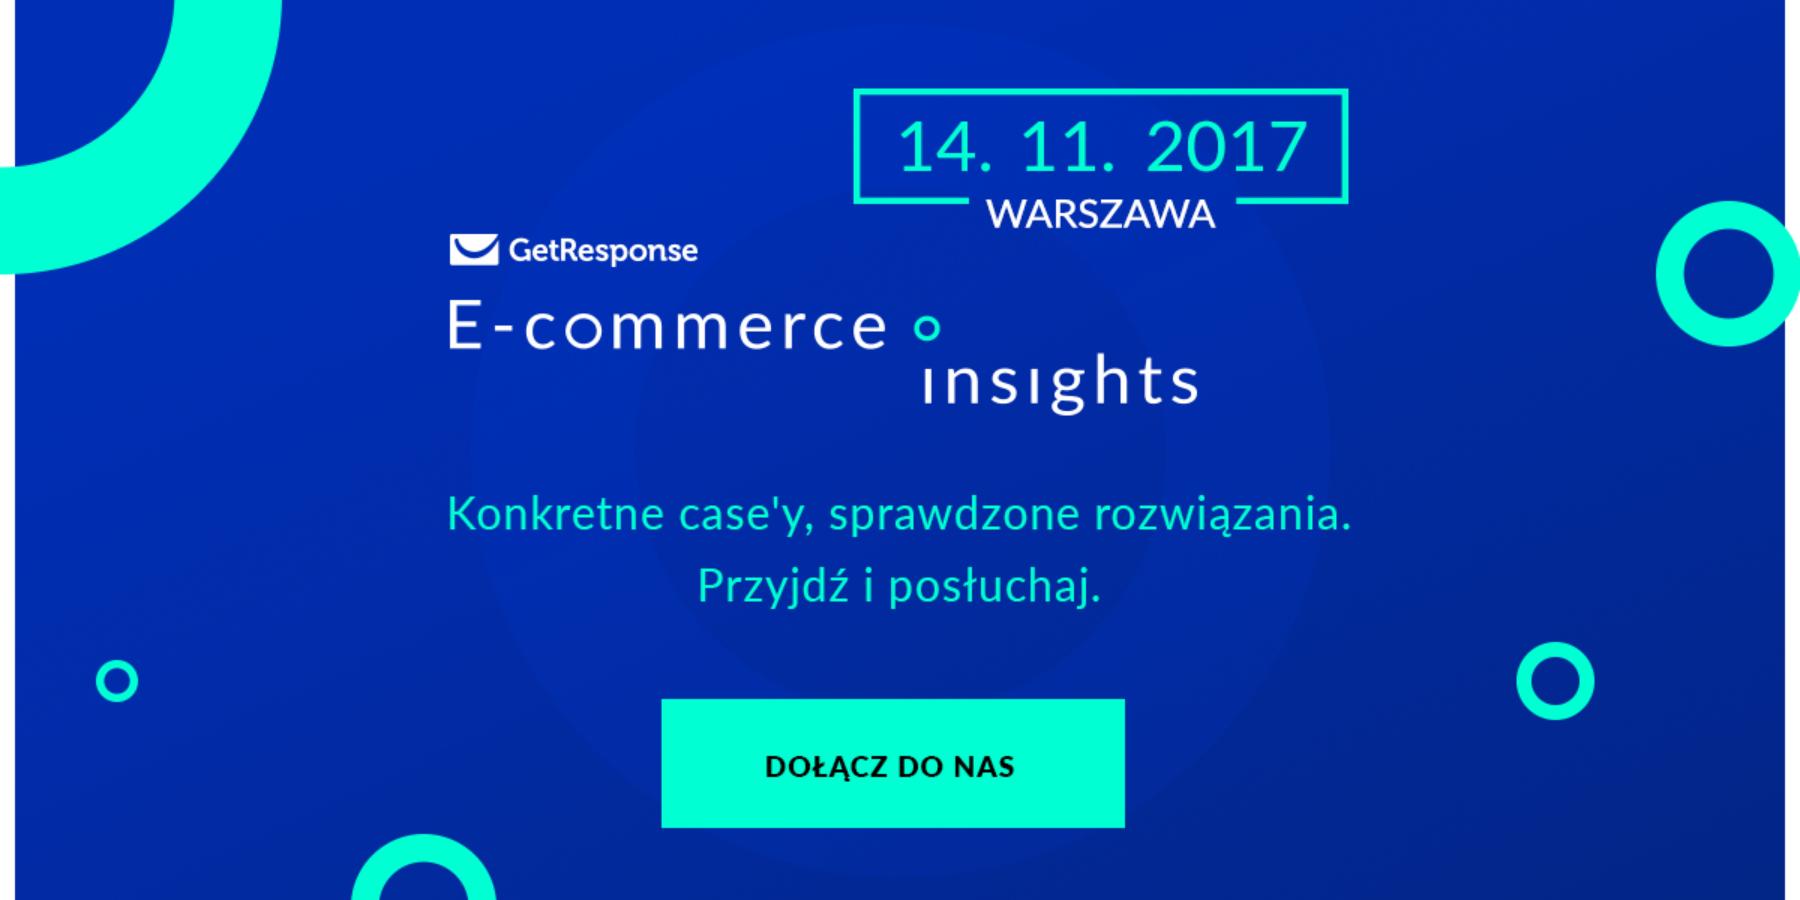 E-commerce Insights iResponseCon – GetResponse ogłasza serię konferencji  wPolsce iUSA